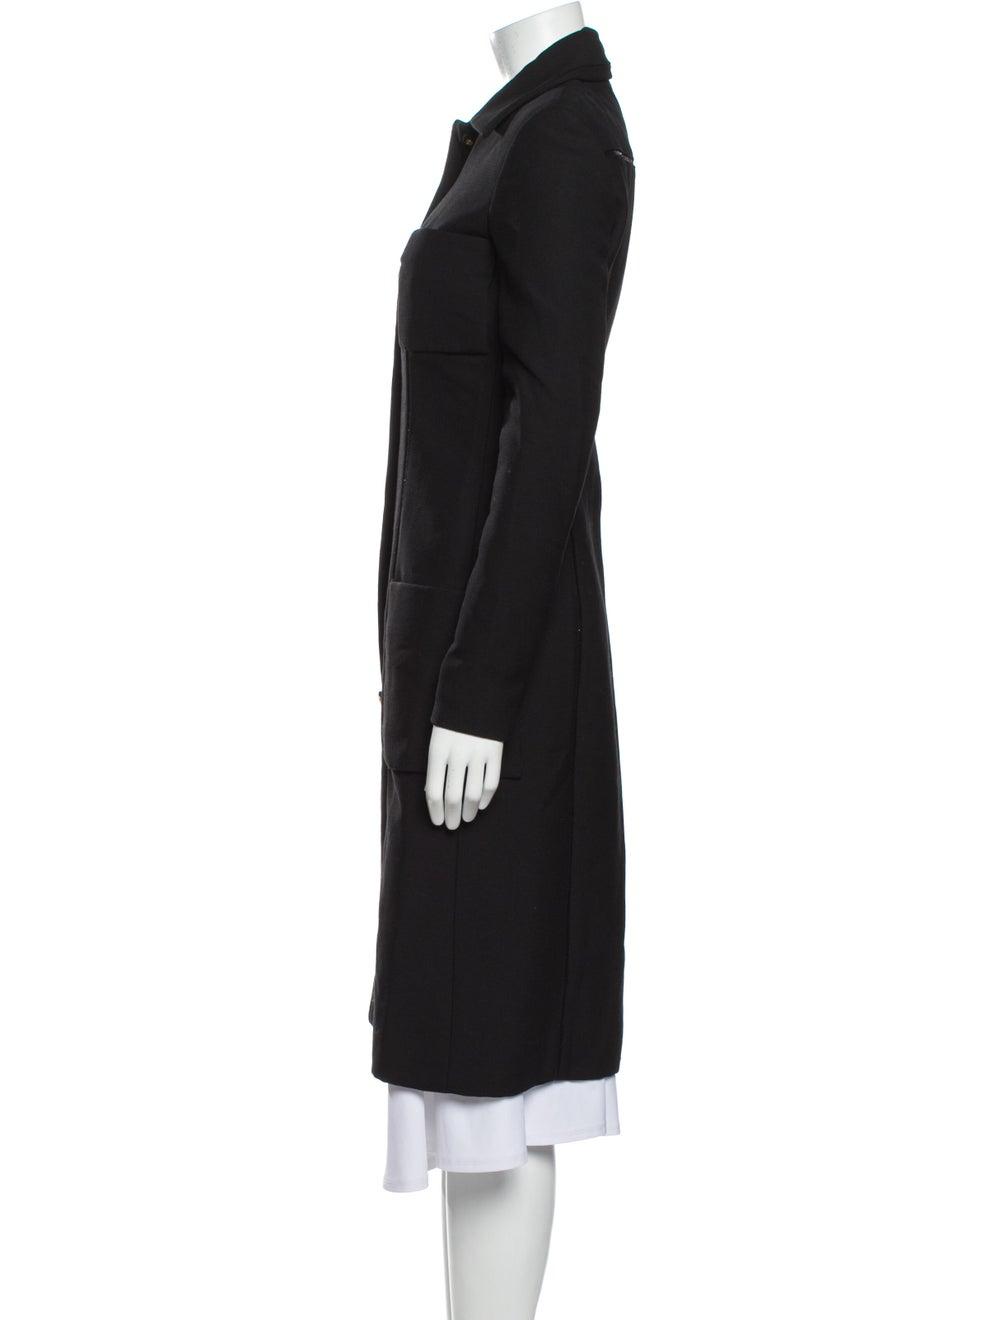 Gianni Versace Vintage Coat Black - image 2